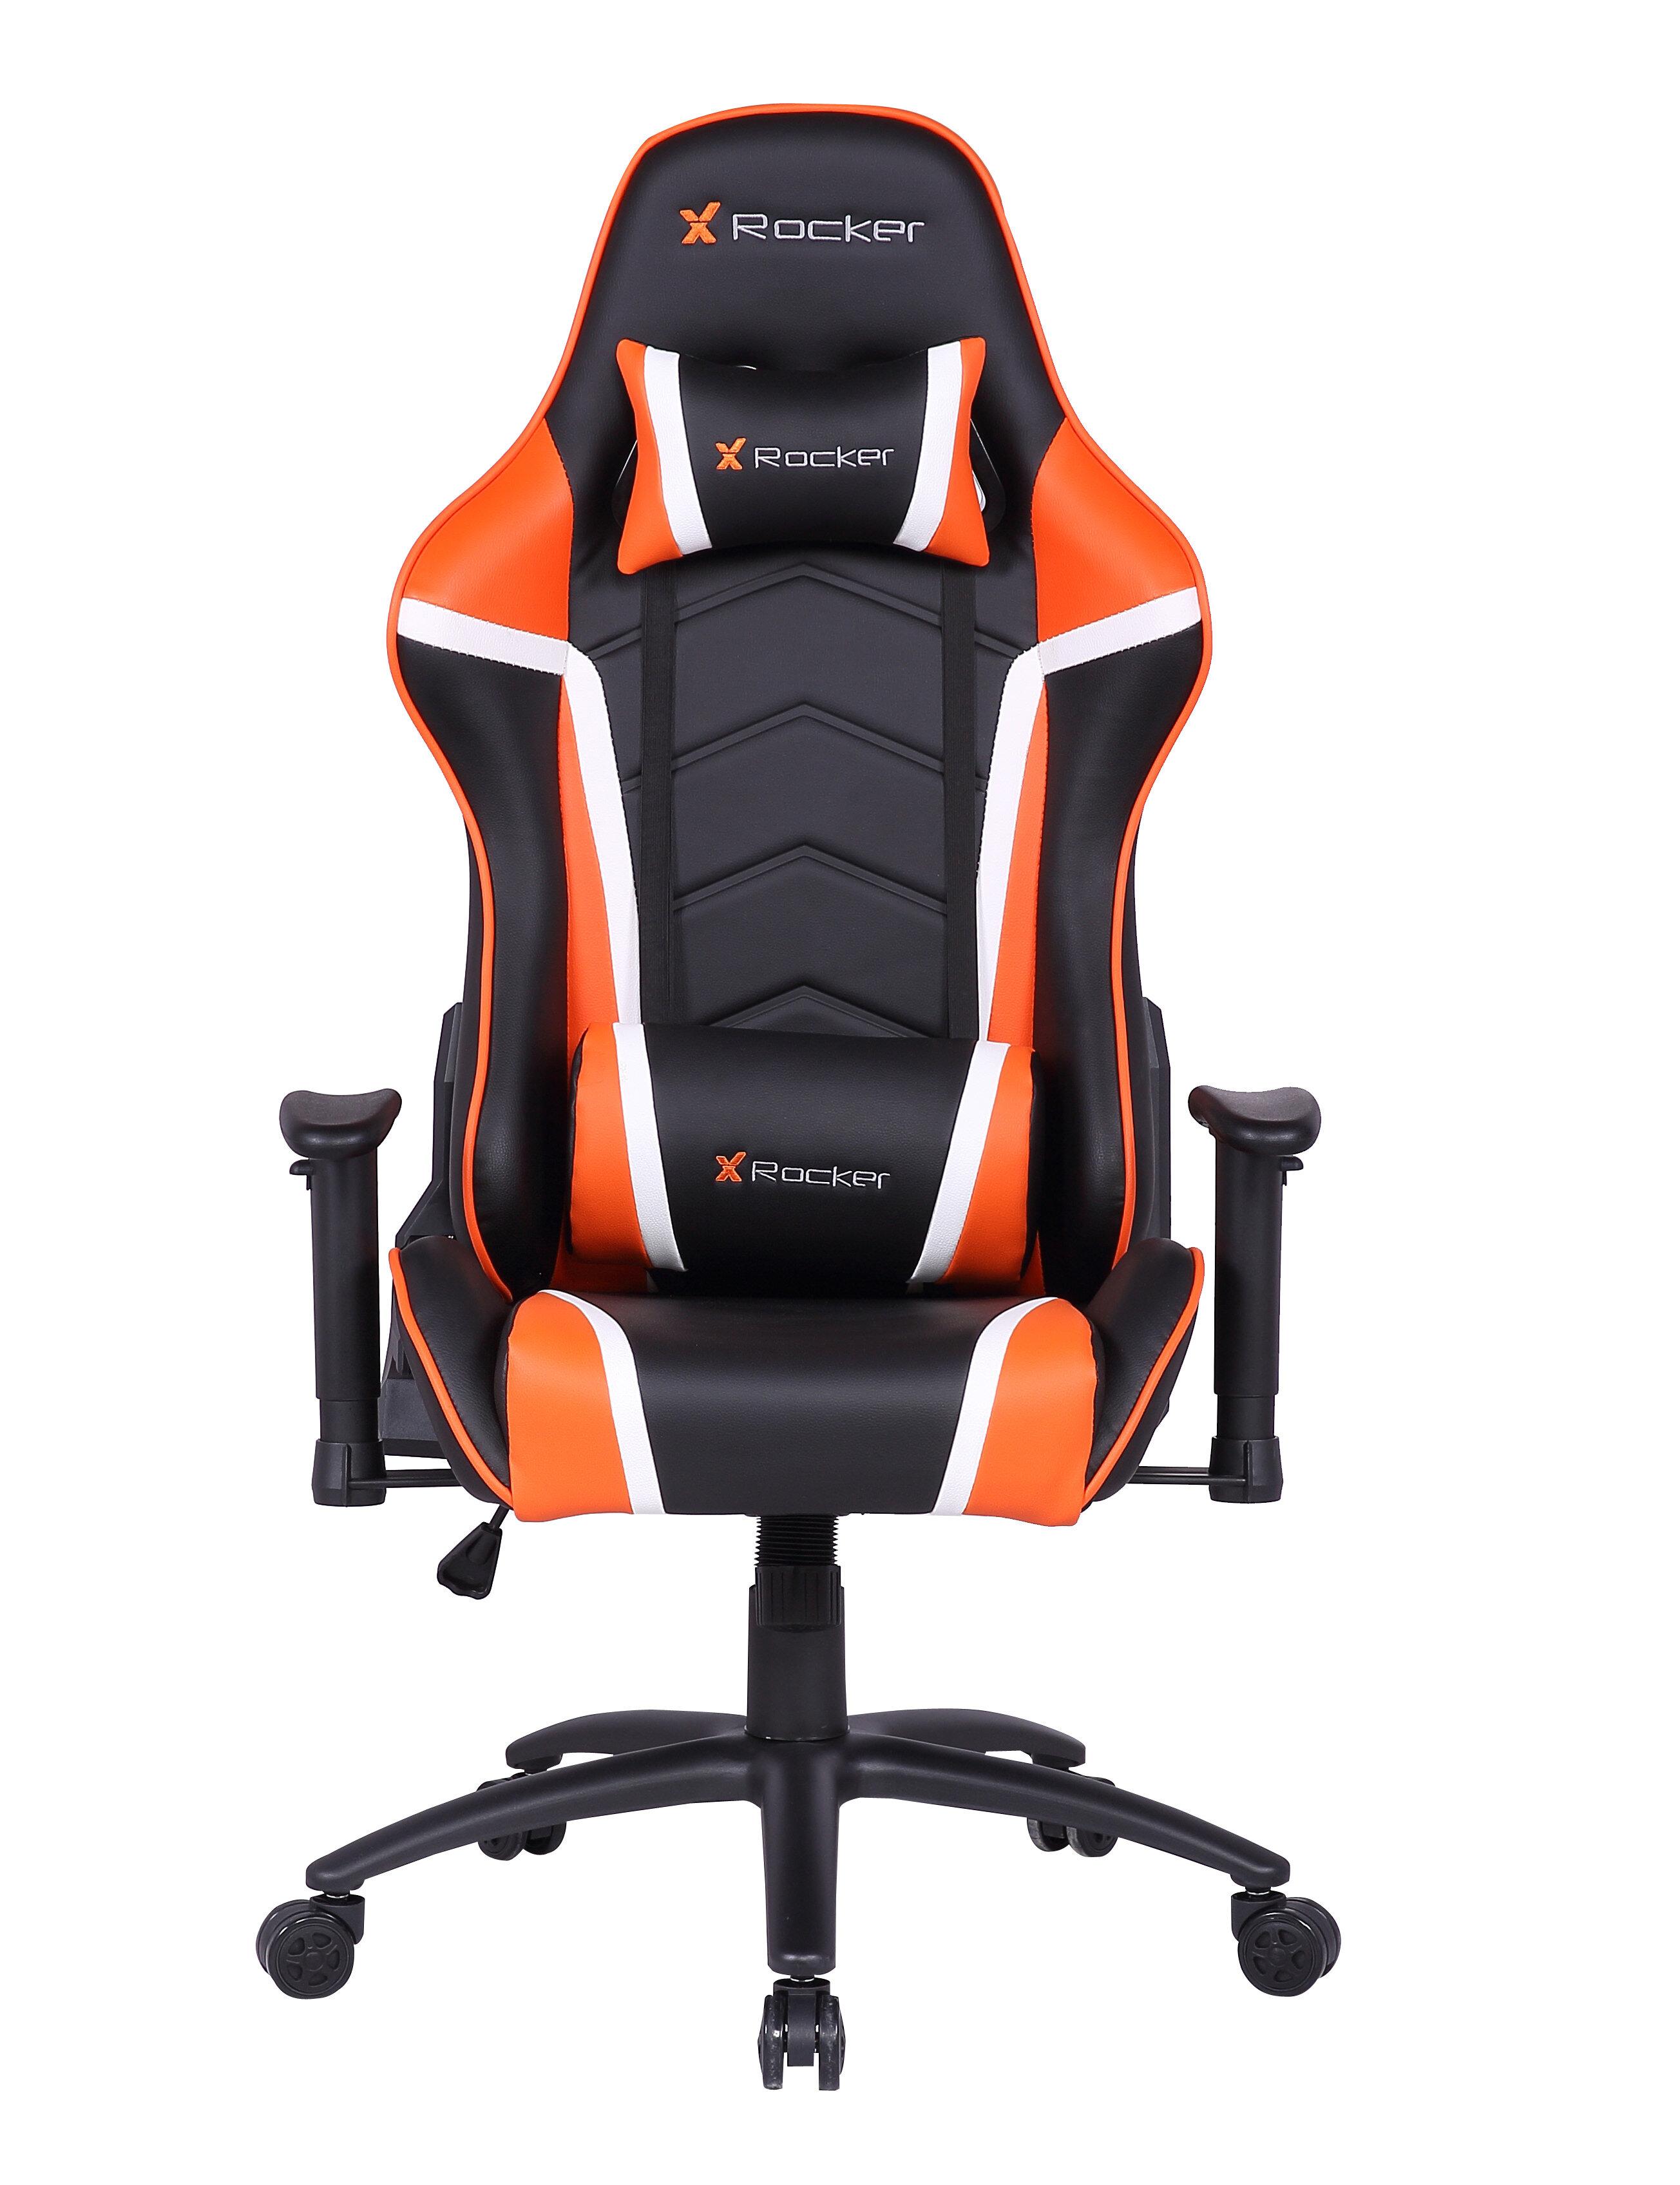 X Rocker Adrenaline Gaming Chair | Wayfair